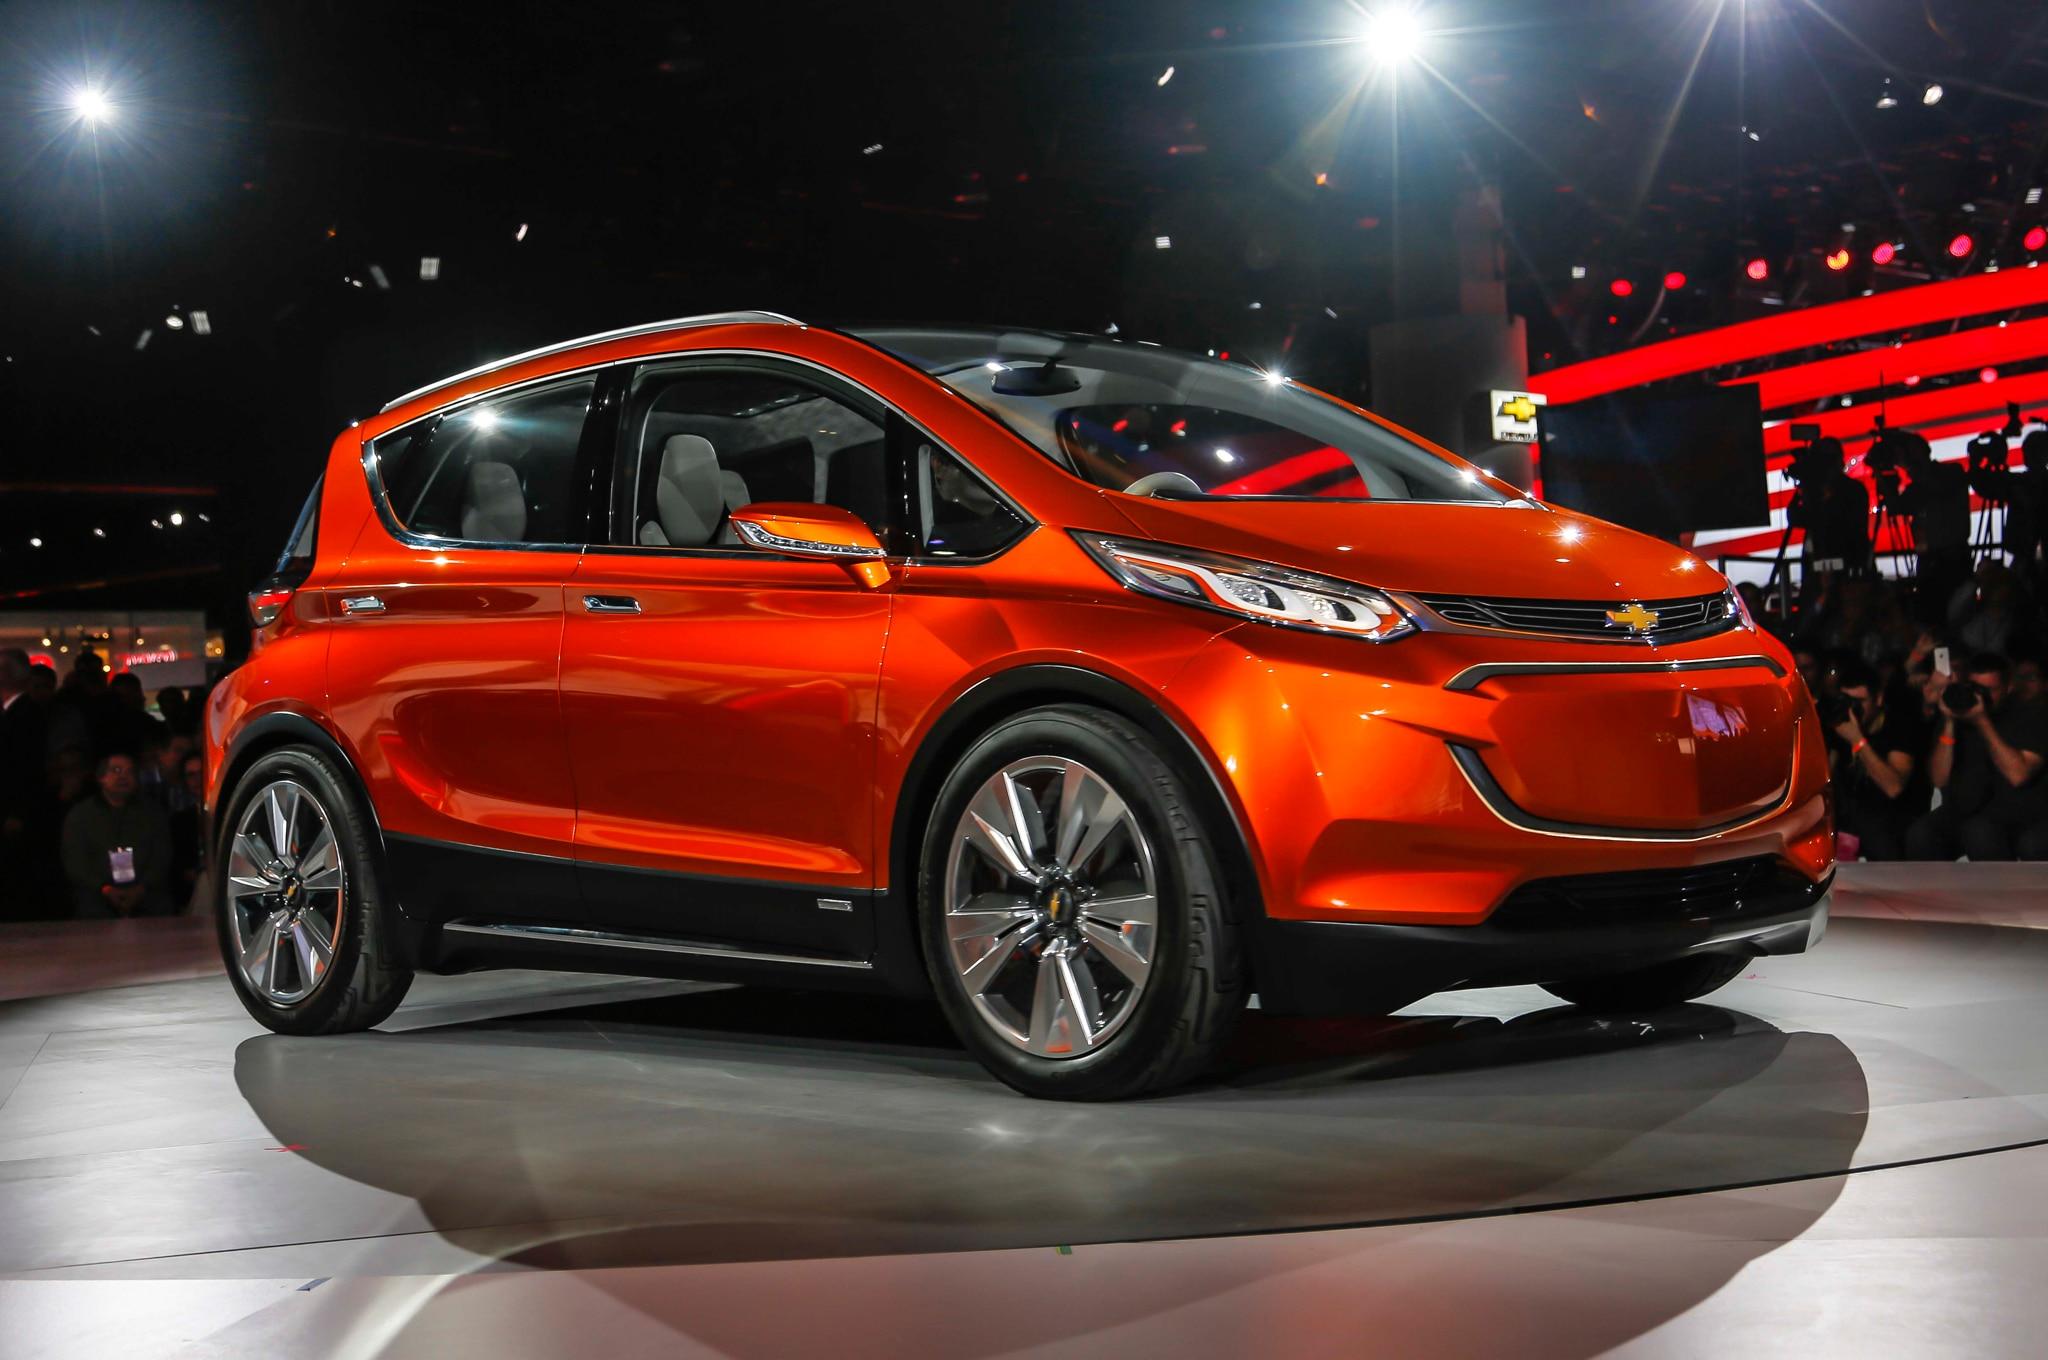 2015 Chevrolet Bolt EV Concept Front Three Quarters 02